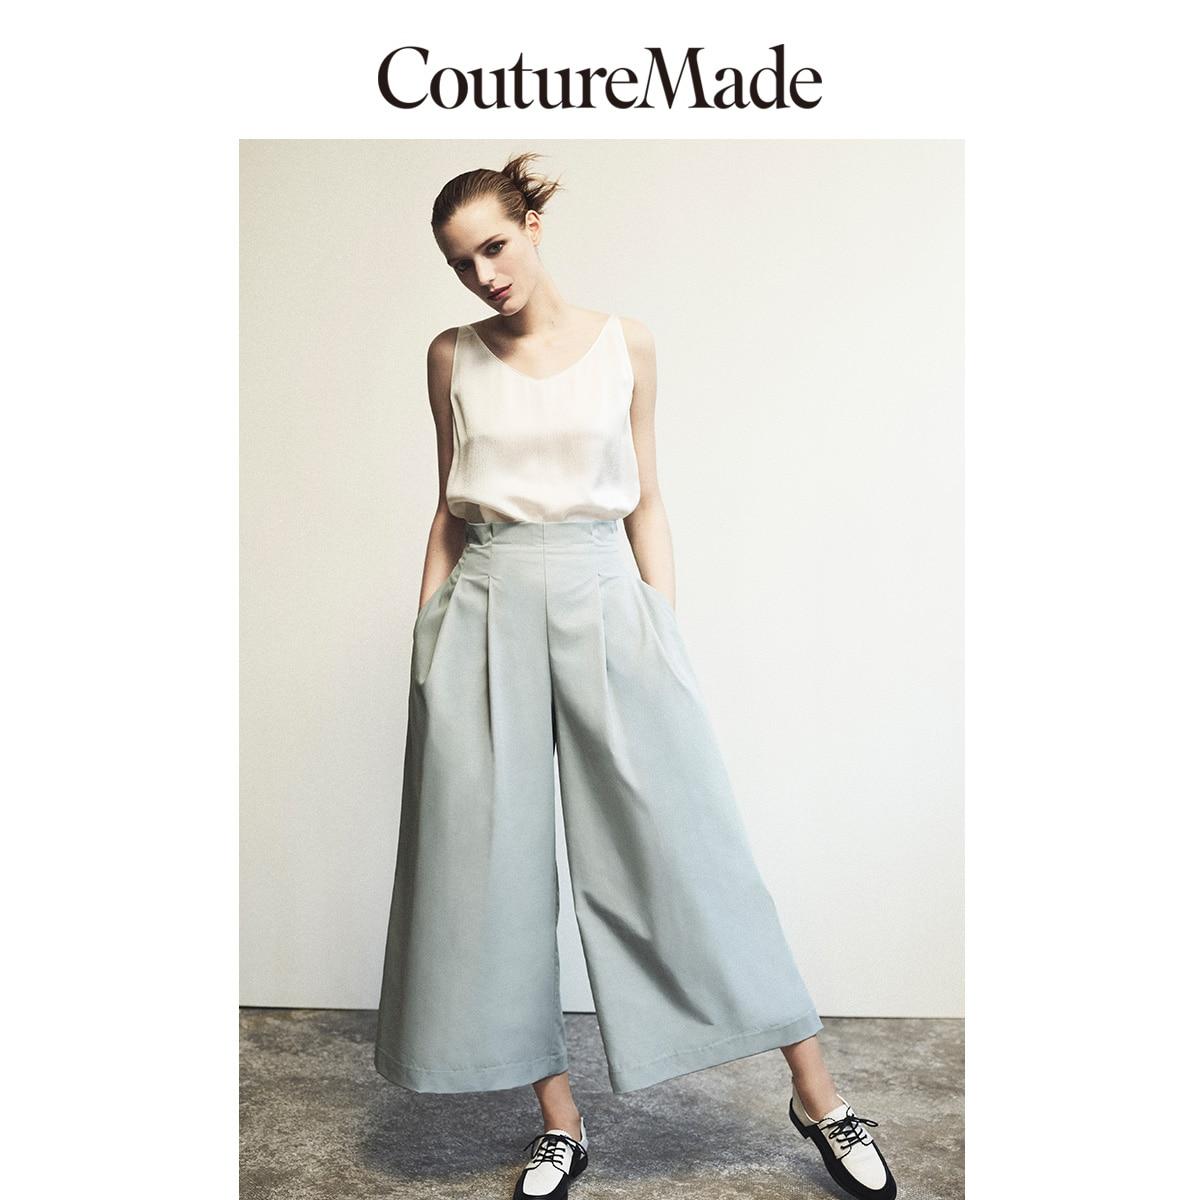 Vero Moda CoutureMade Women's Wide-leg Elasticized Back Waist Pants   319250512